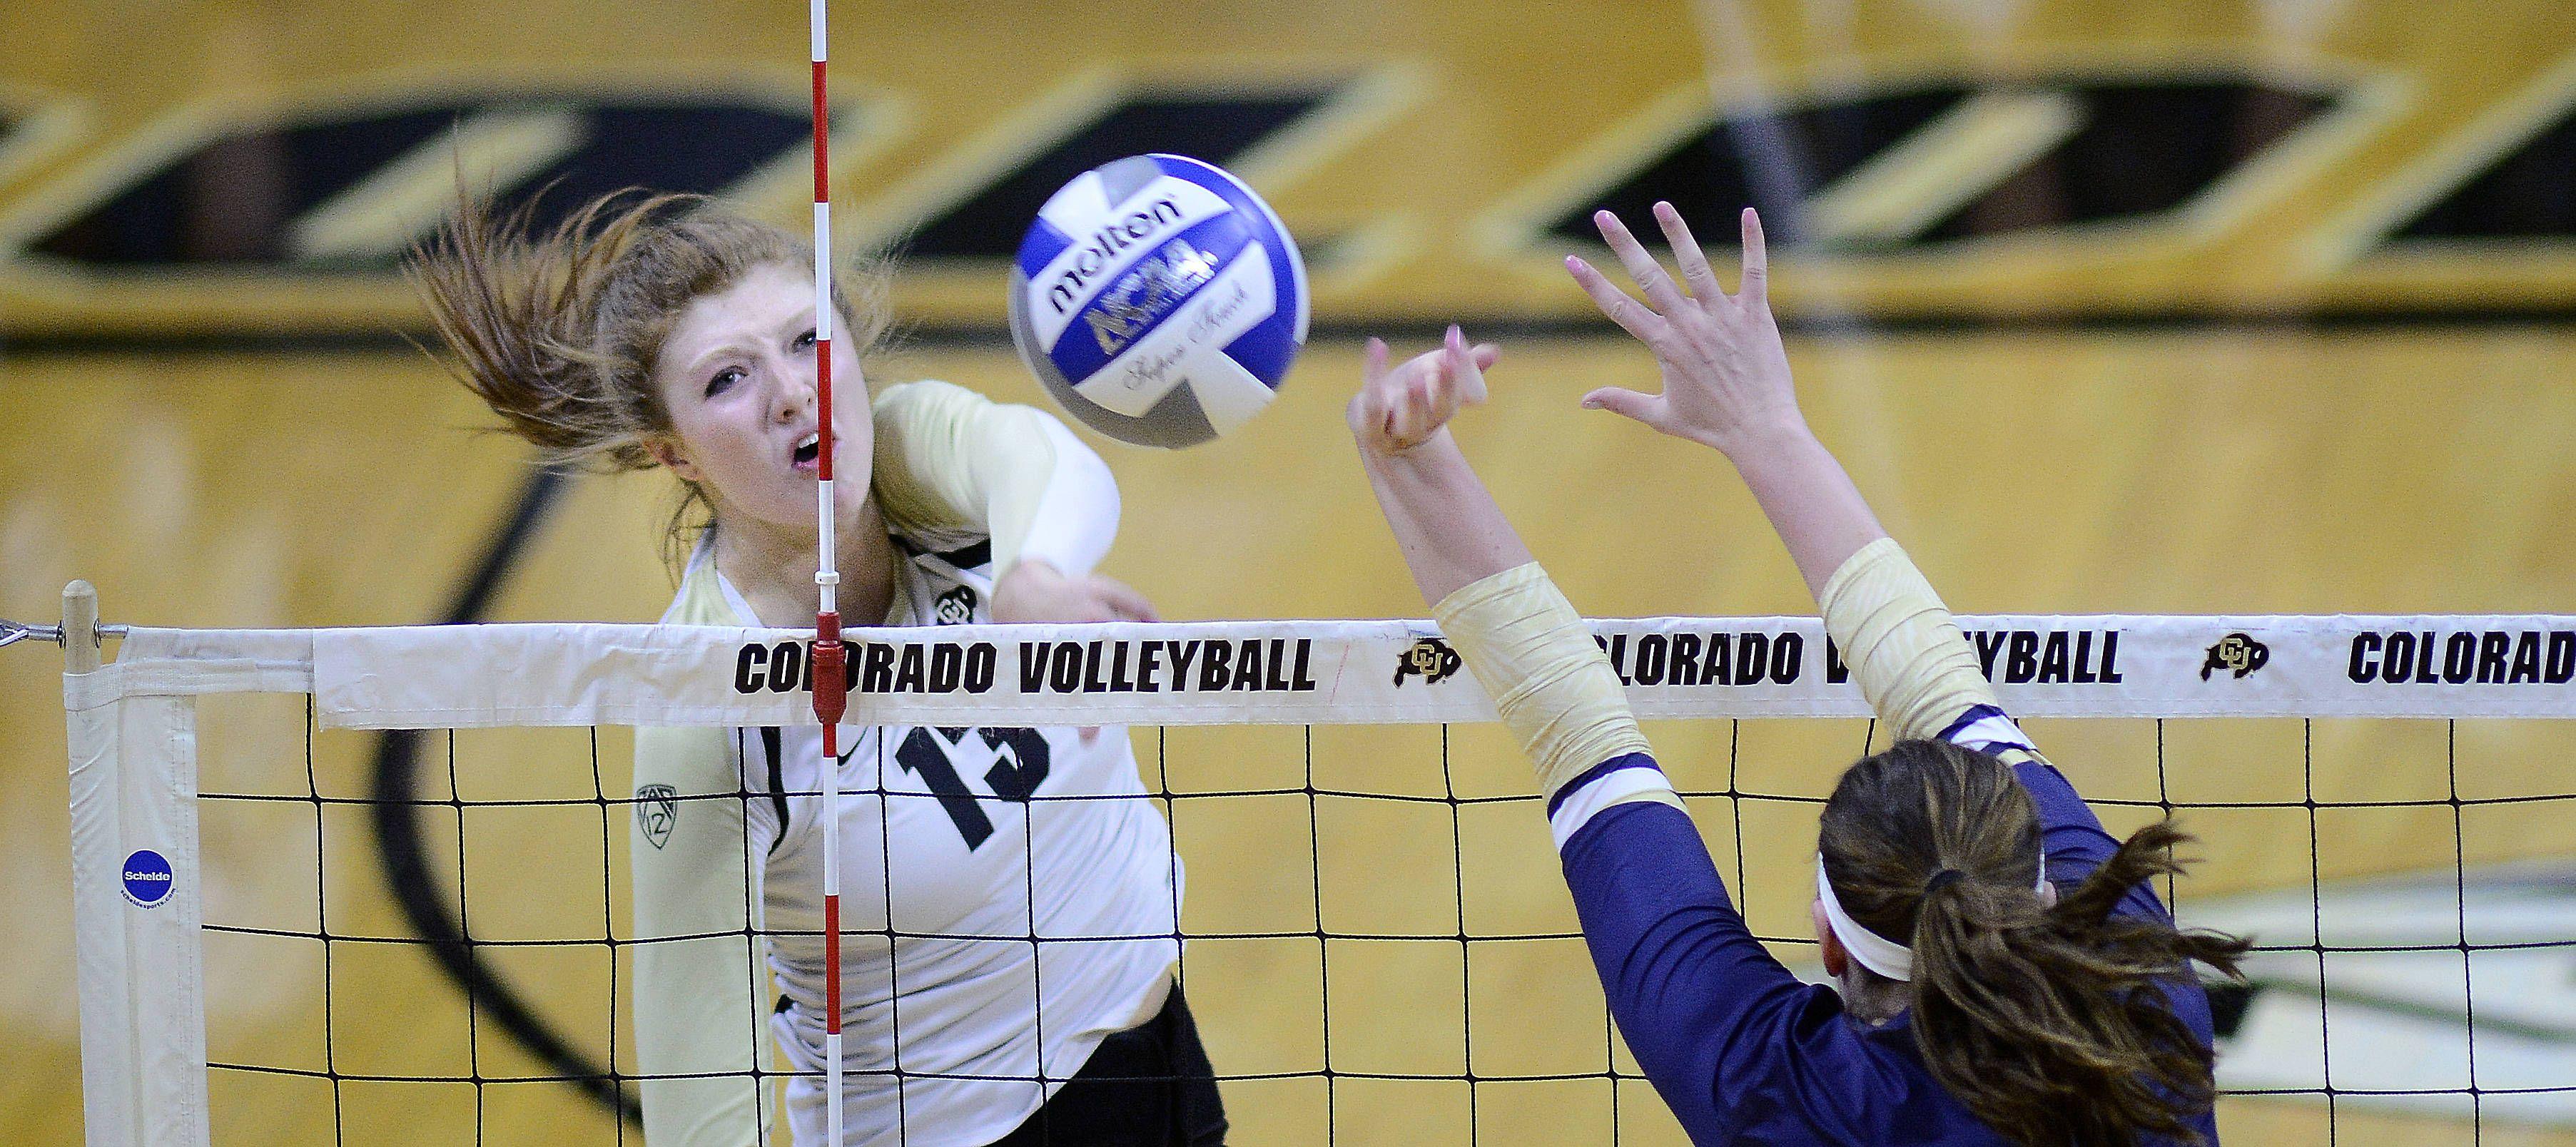 Simpson Selected To U S Cnt Team Europe Tour University Of Colorado Athletics Europe Tours Usa Volleyball University Of Colorado